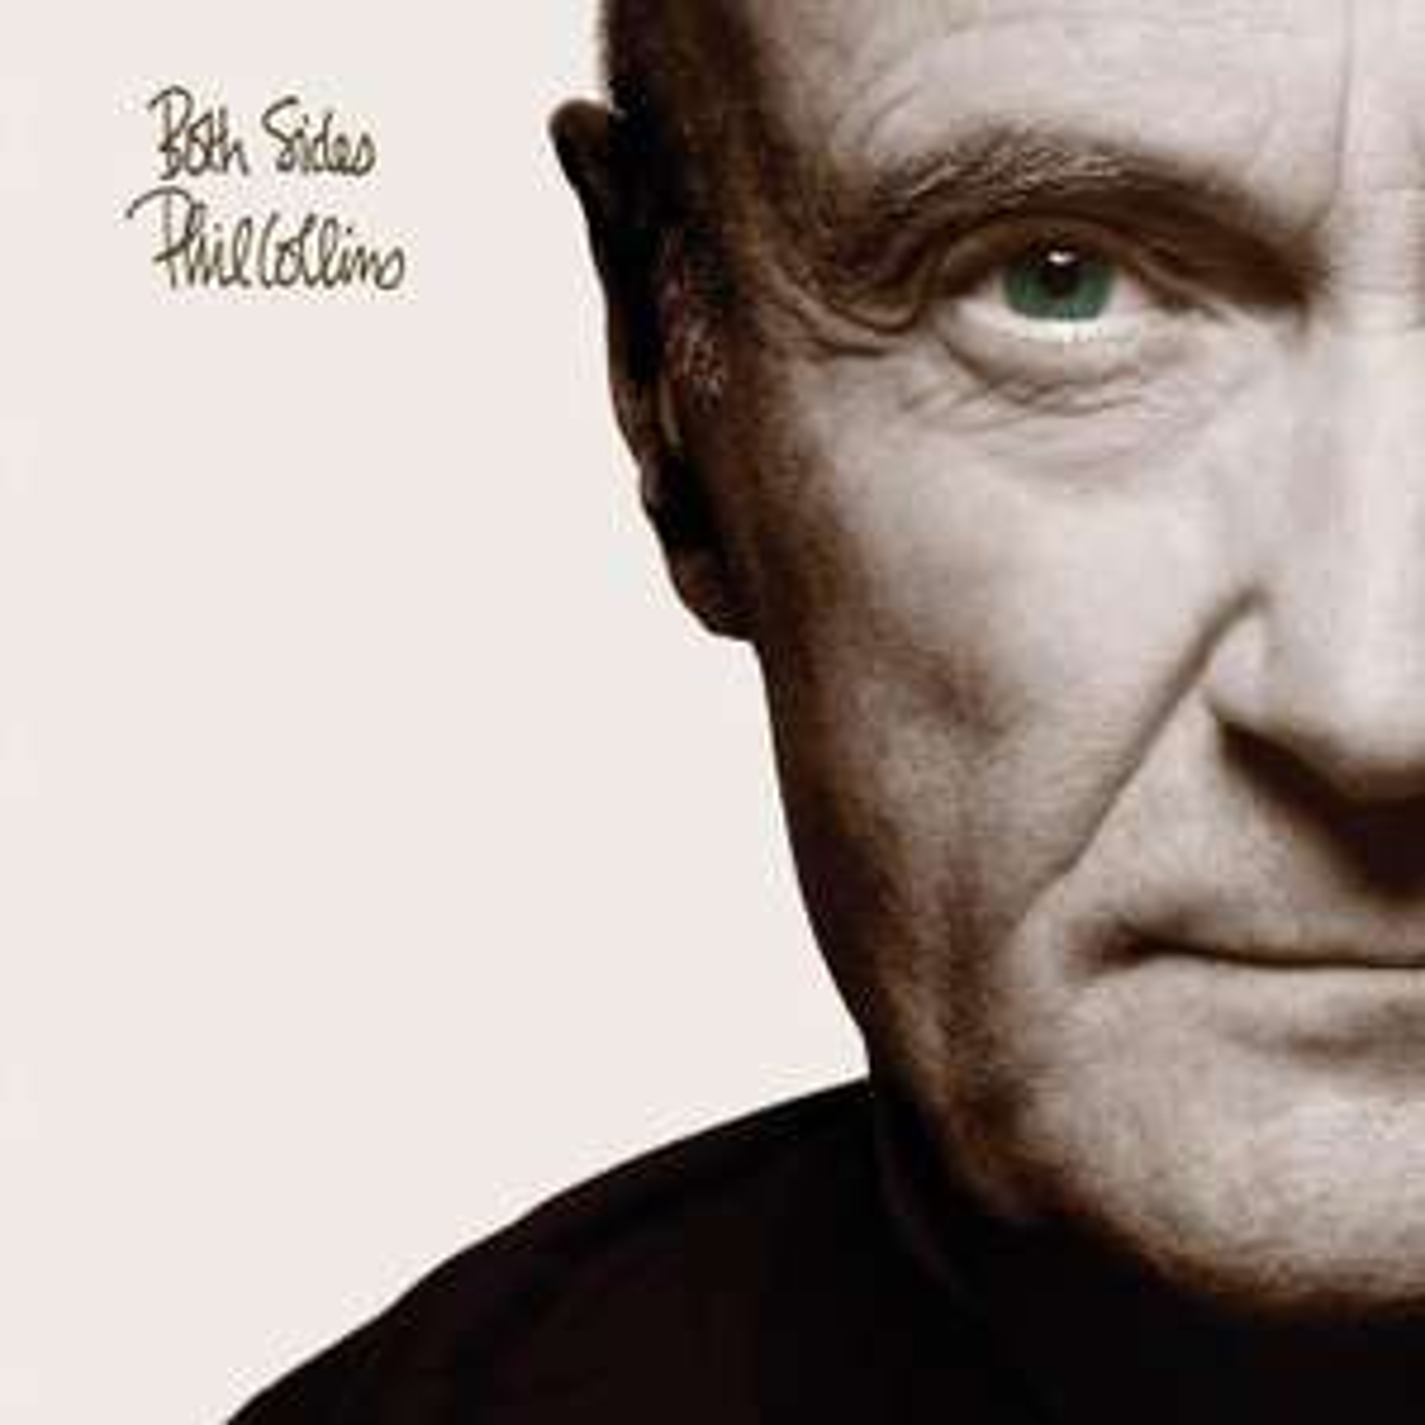 Vinyle Phil Collins Both Sides